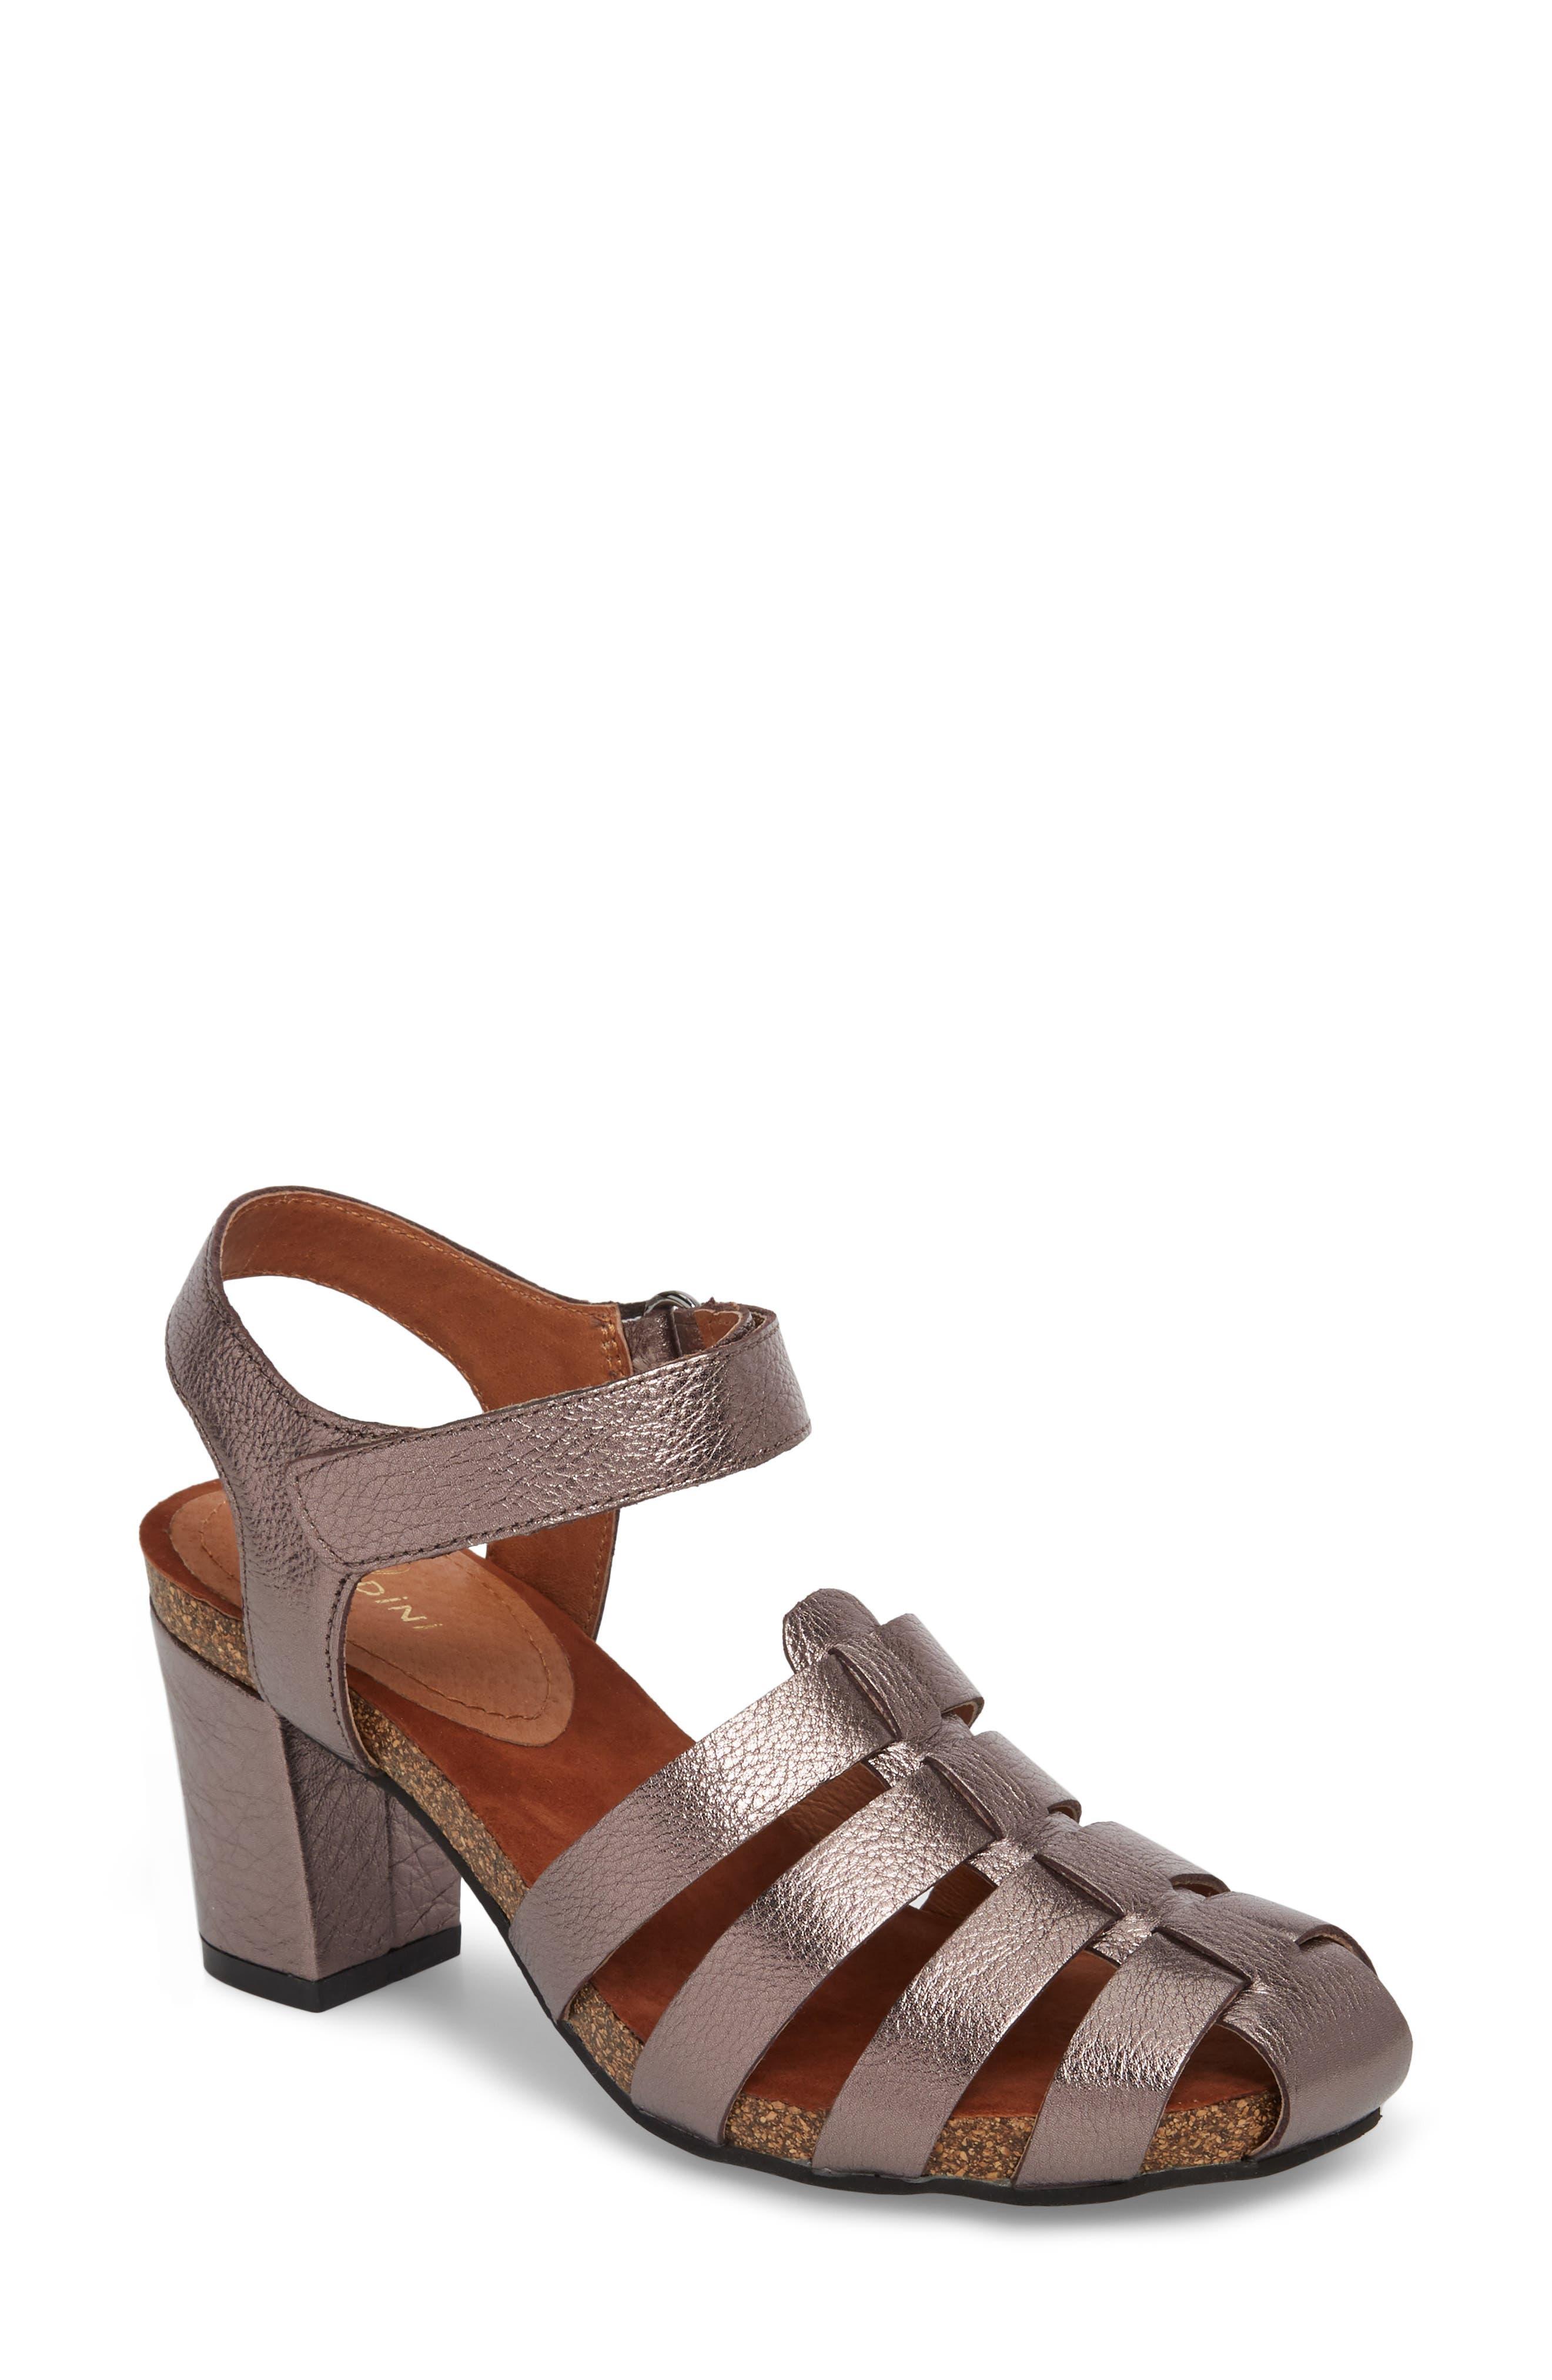 Sudini Carrara Block Heel Sandal W - Metallic